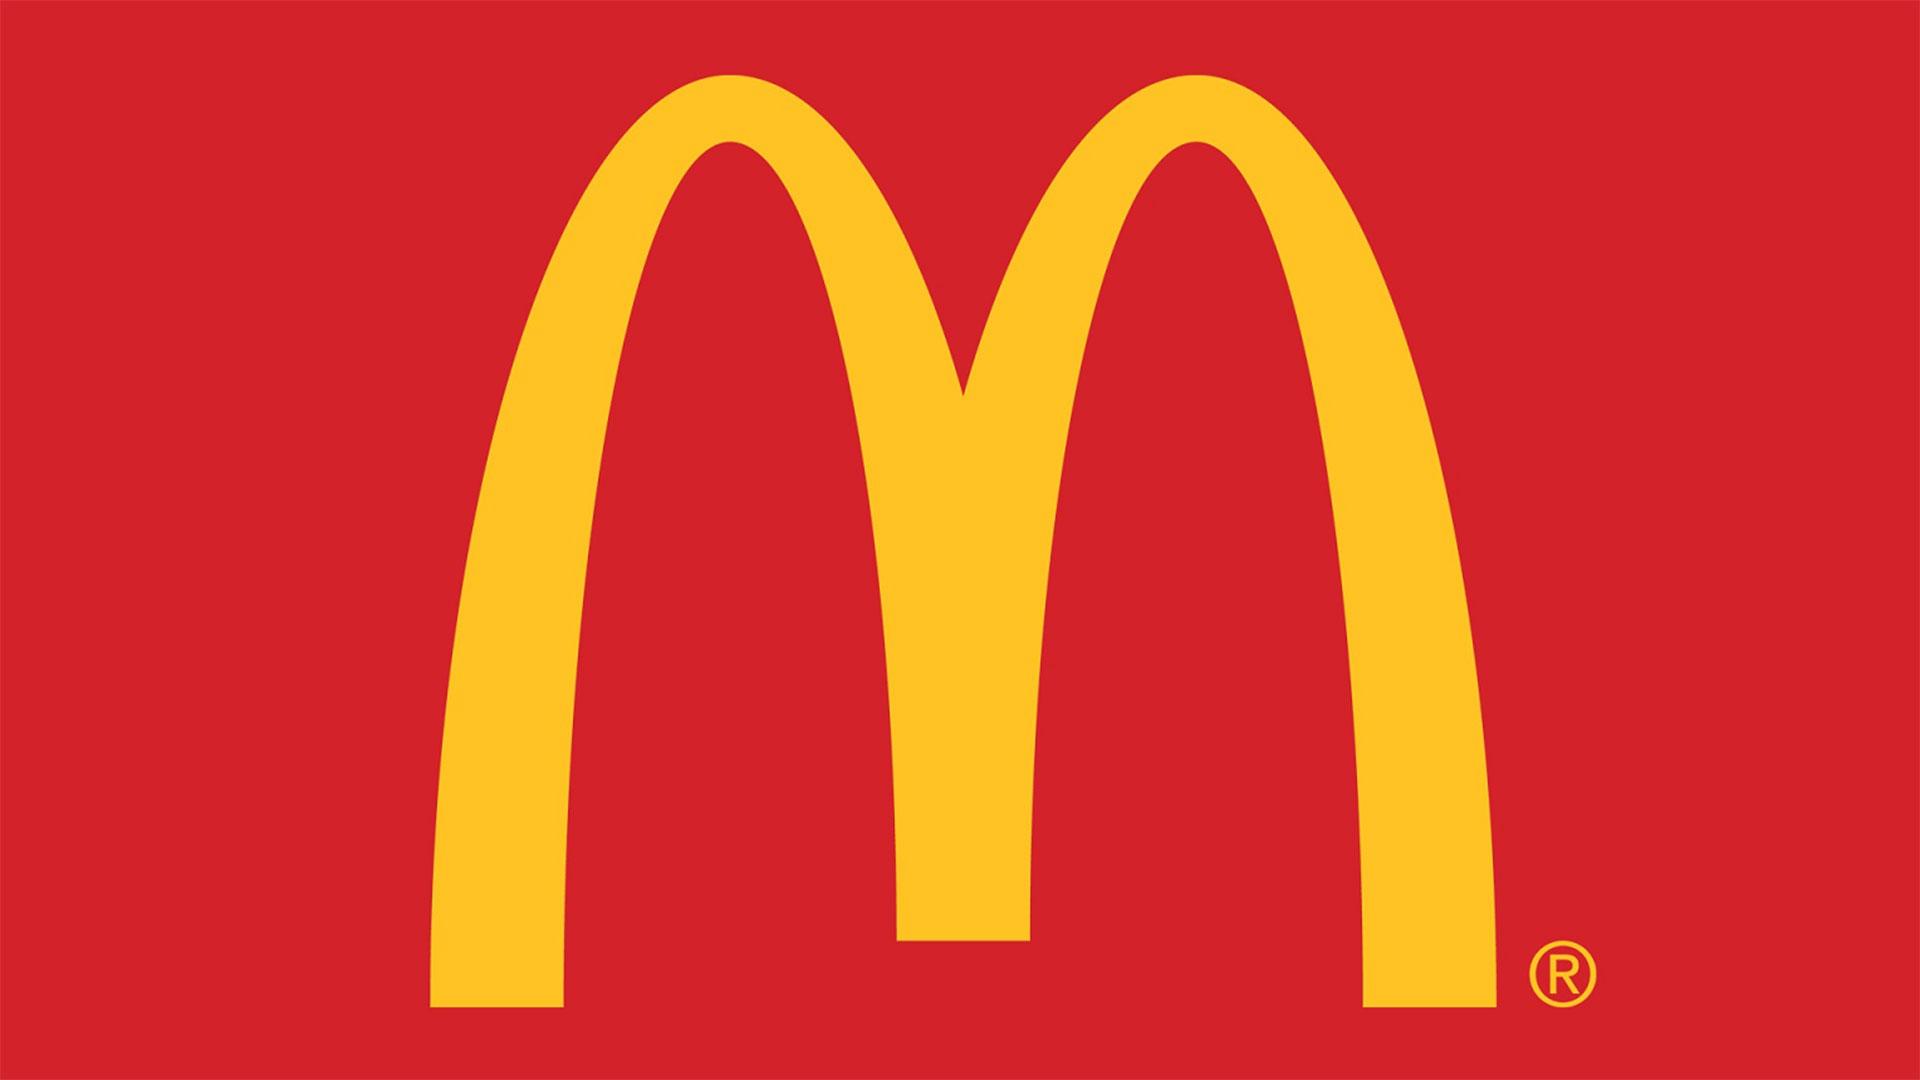 KELO McDonald's logo fast food restaurant